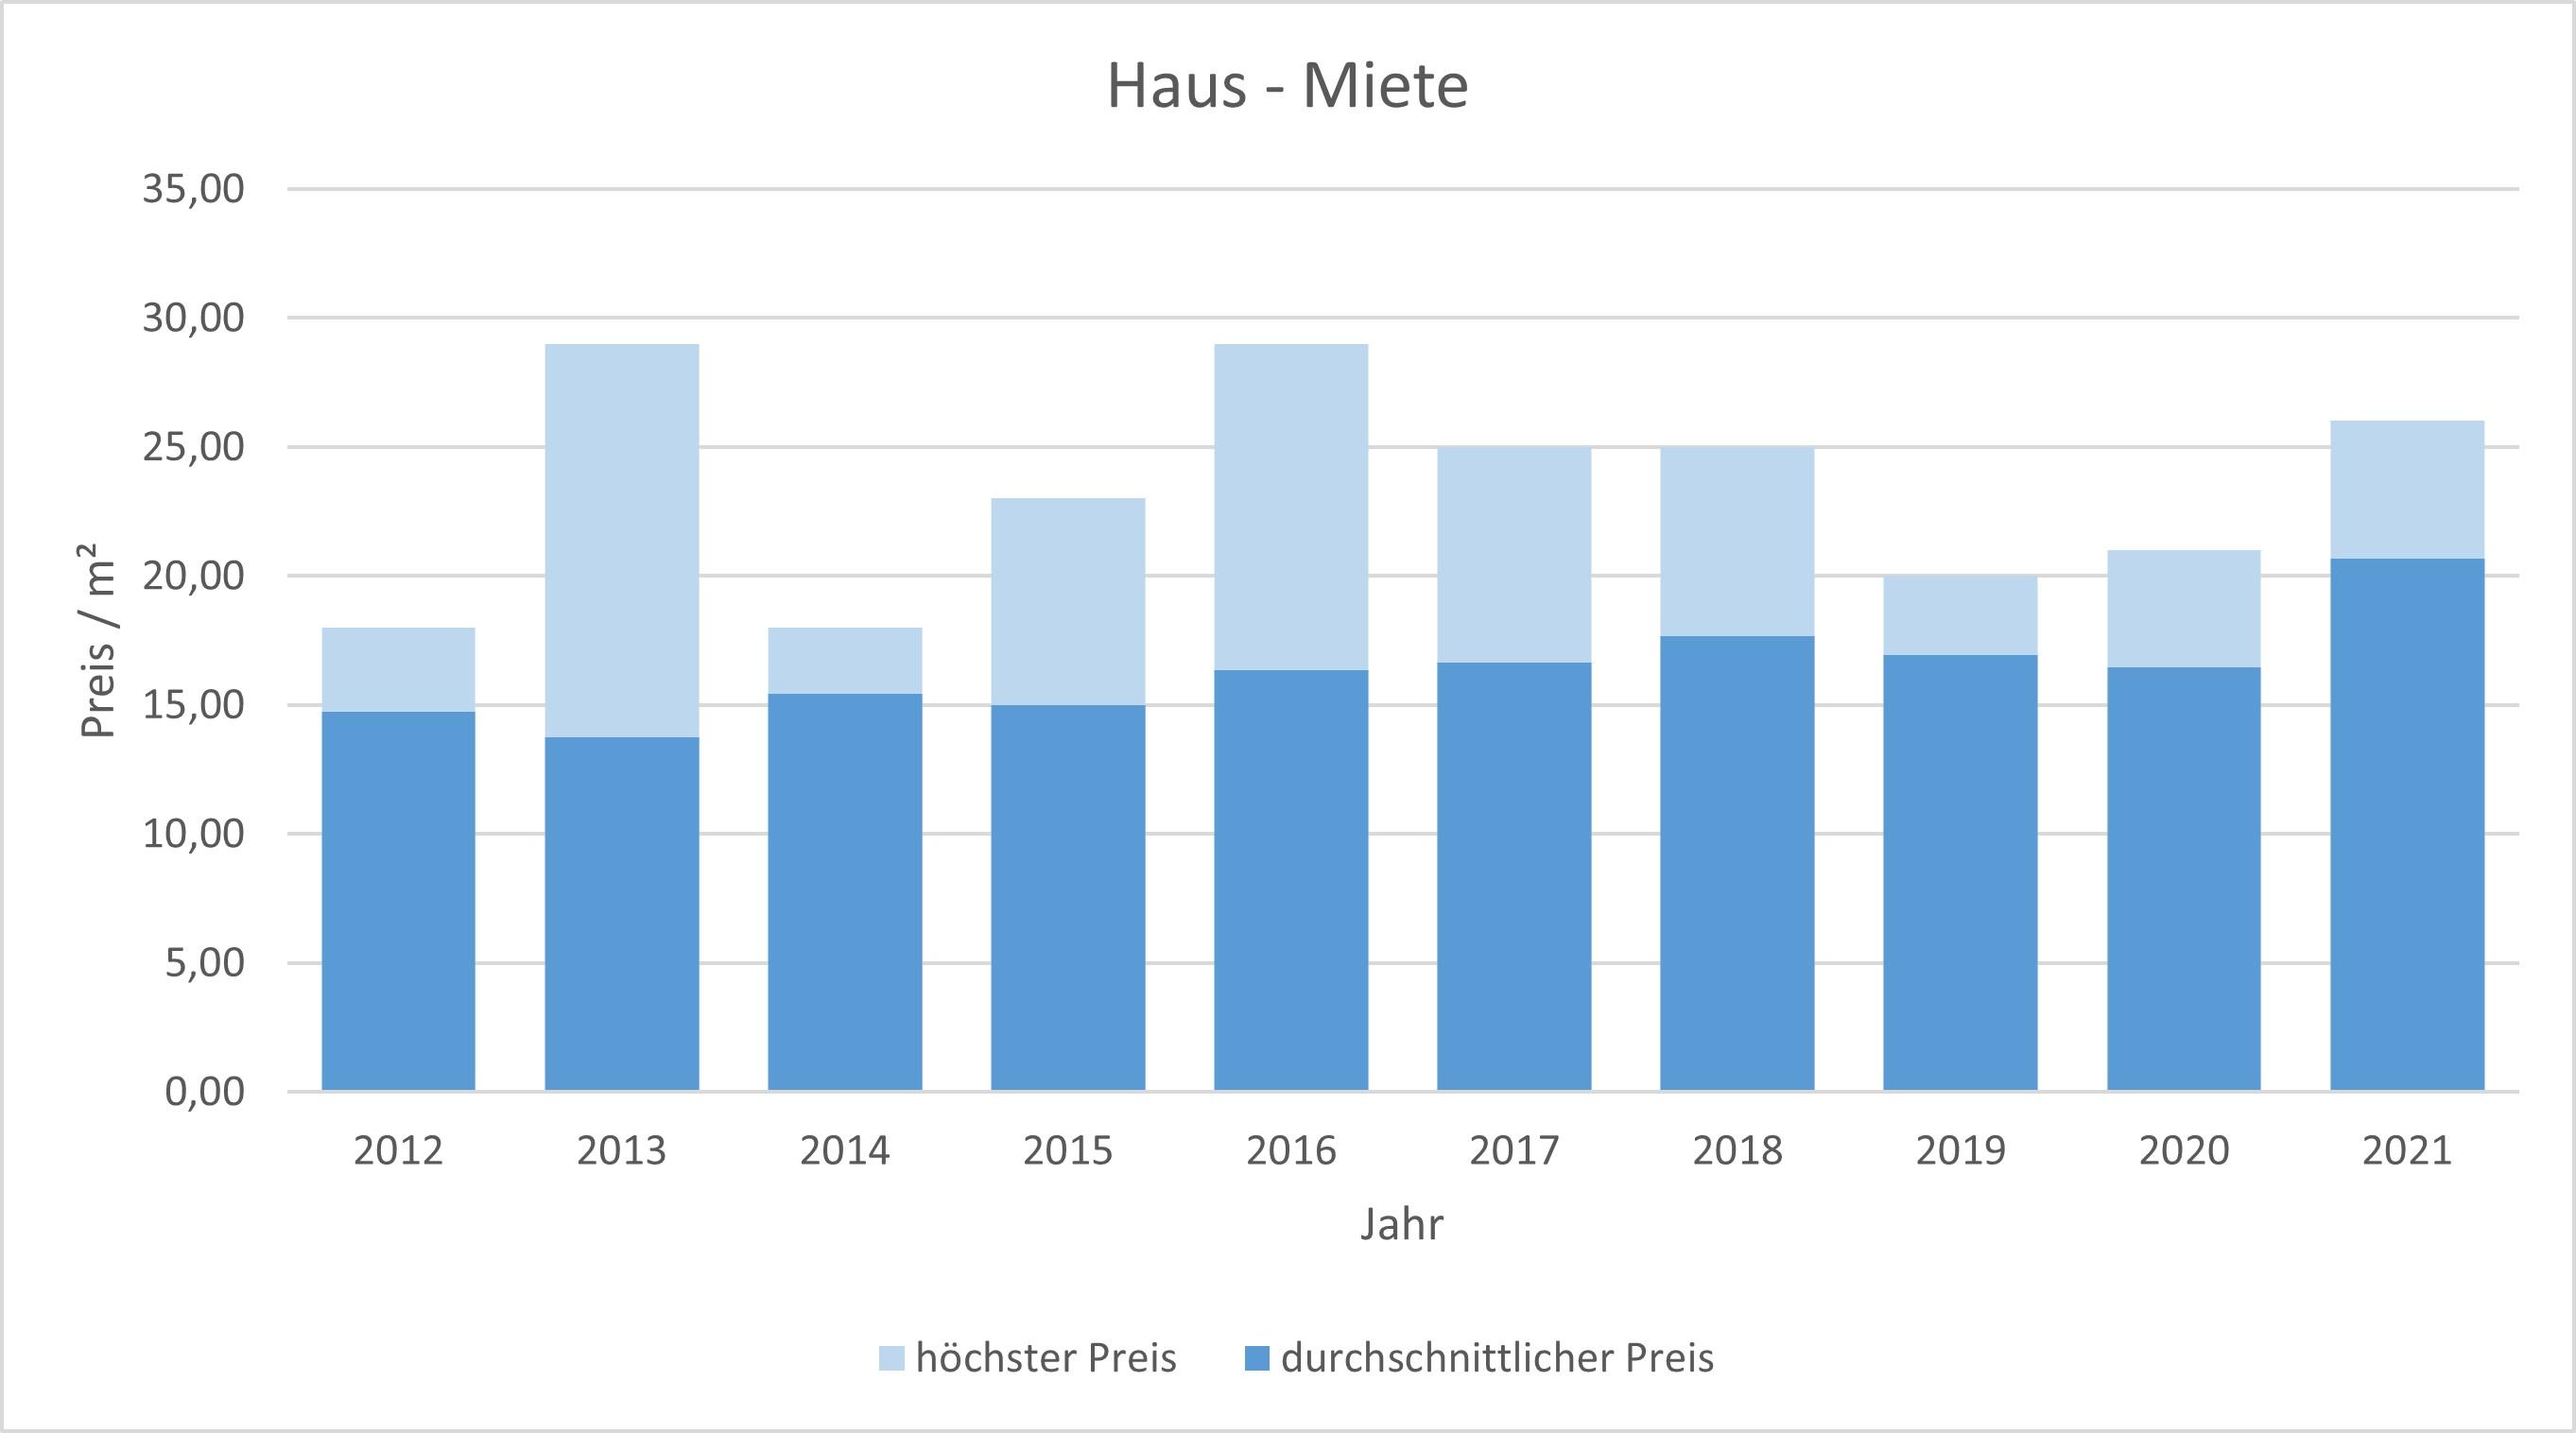 München - Sendling Haus mieten vermieten Preis Bewertung Makler www.happy-immo.de 2019 2020 2021